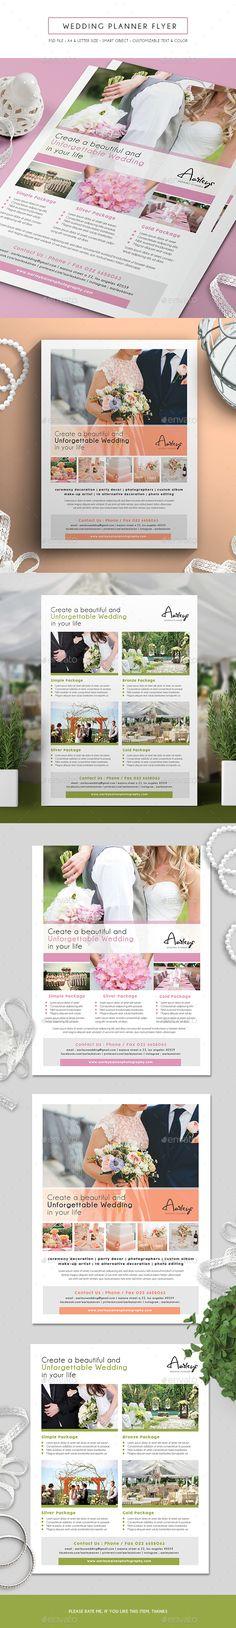 Wedding Planner Flyer - Corporate Flyers #Design #Flyer #Template Download: http://graphicriver.net/item/wedding-planner-flyer/15882193?ref=WebDesignSpider